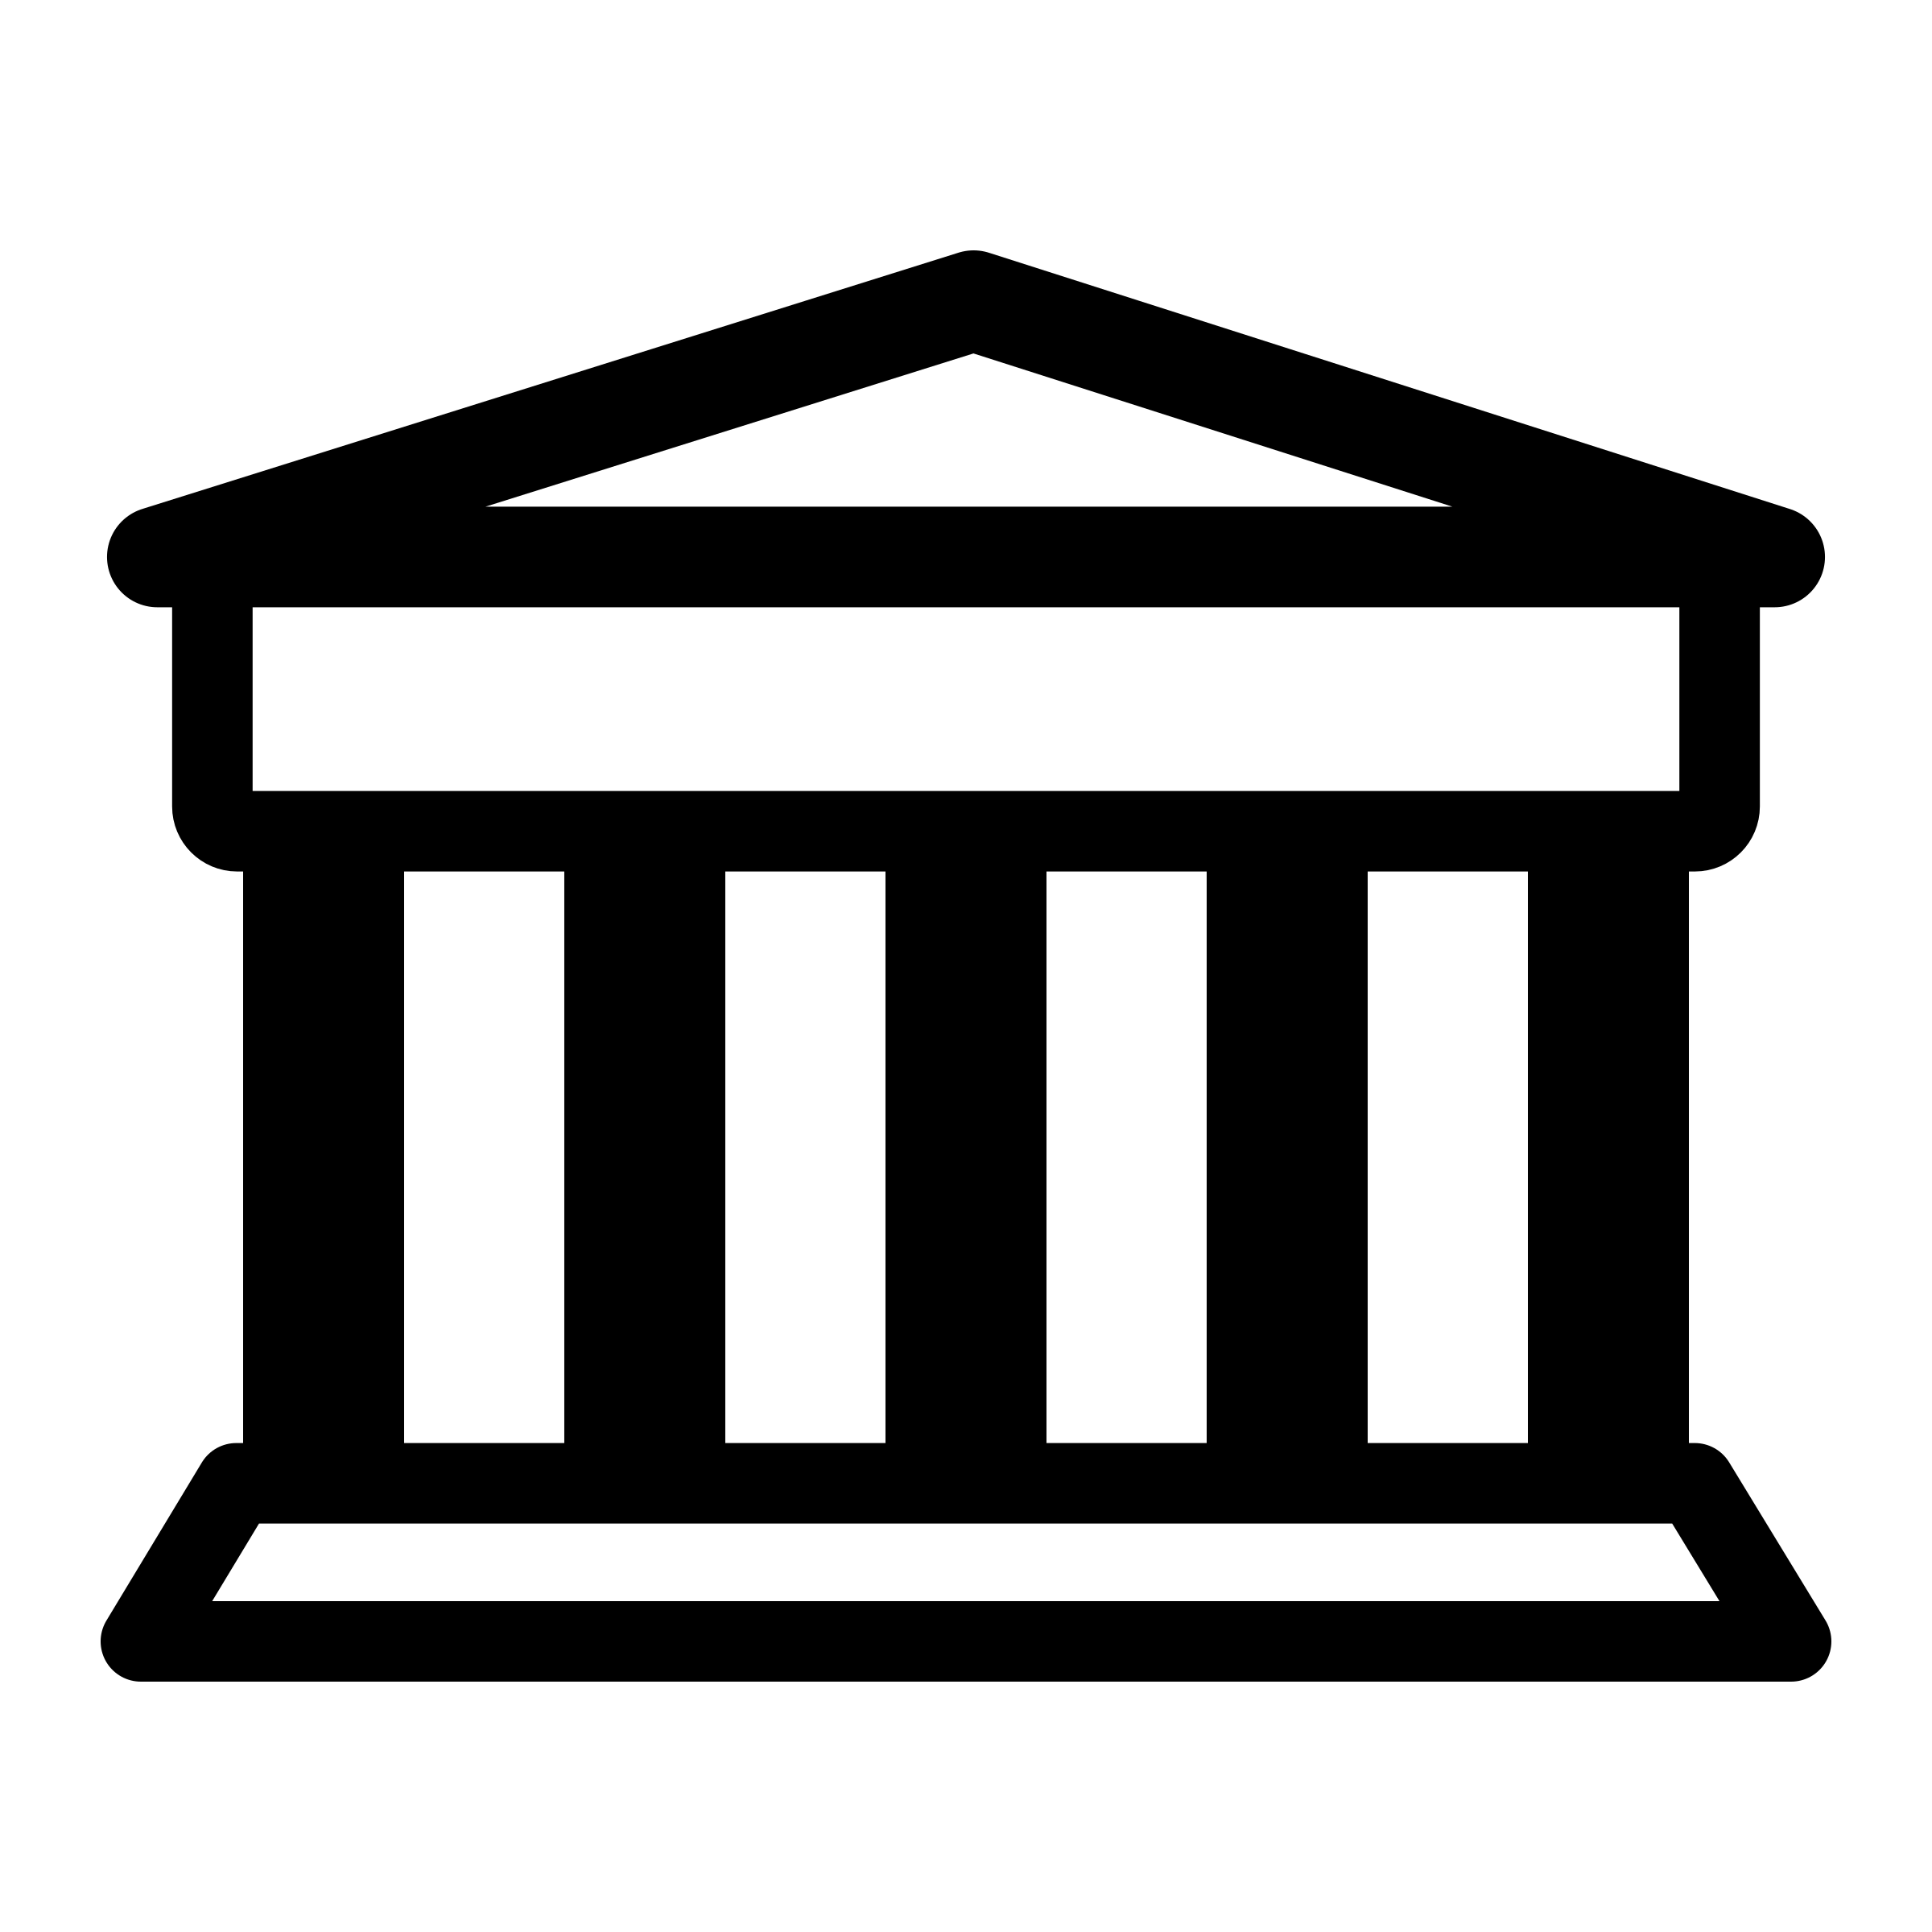 bank clipart-bank clipart-9